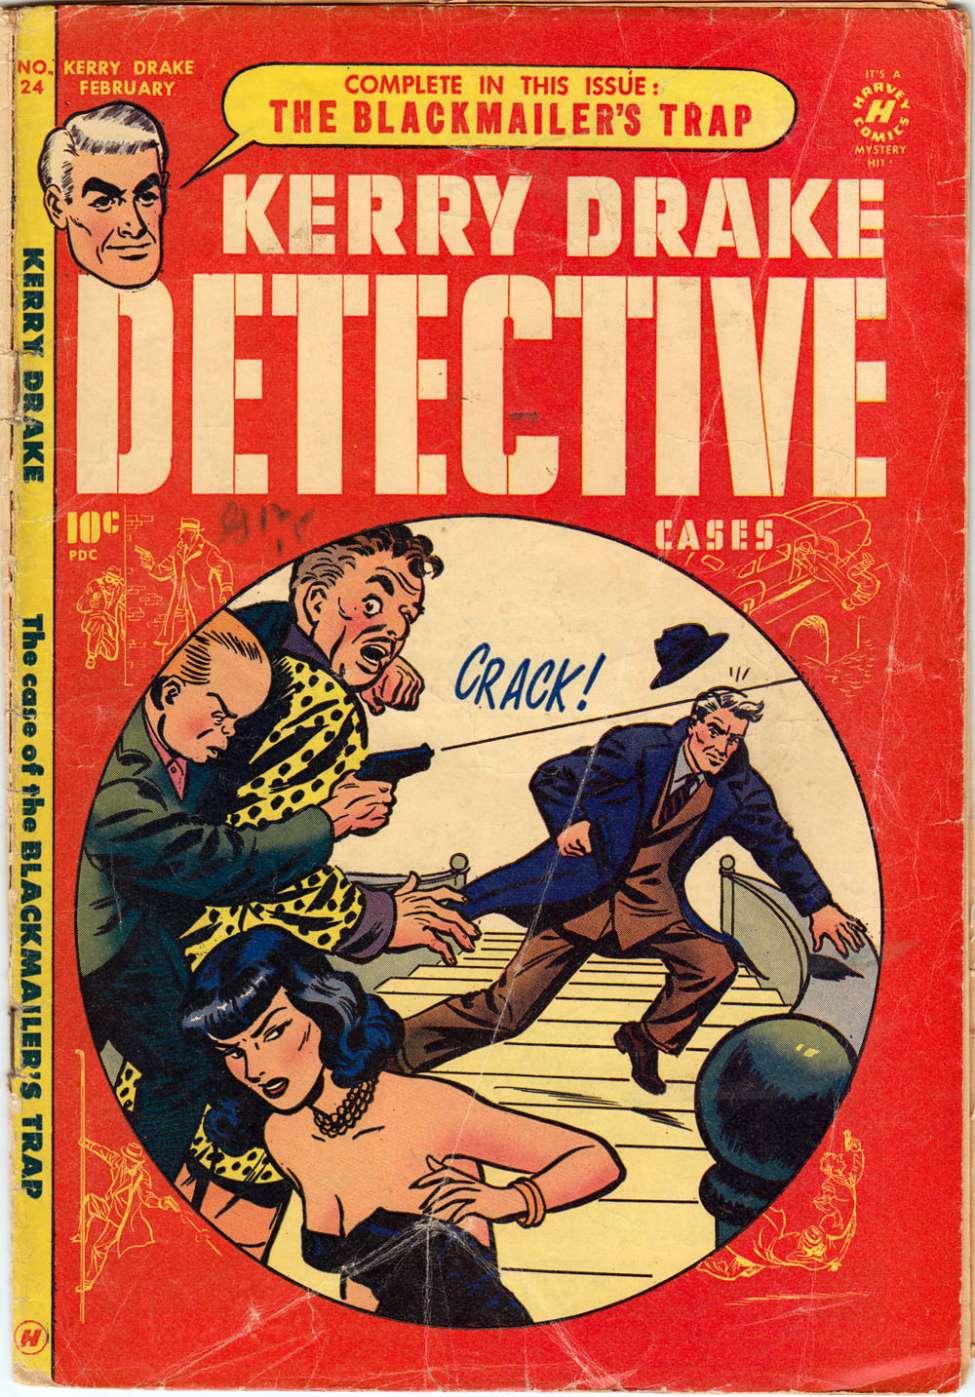 Kerry Drake, l'autre série policière d'Alfred Andriola - Page 4 0_110